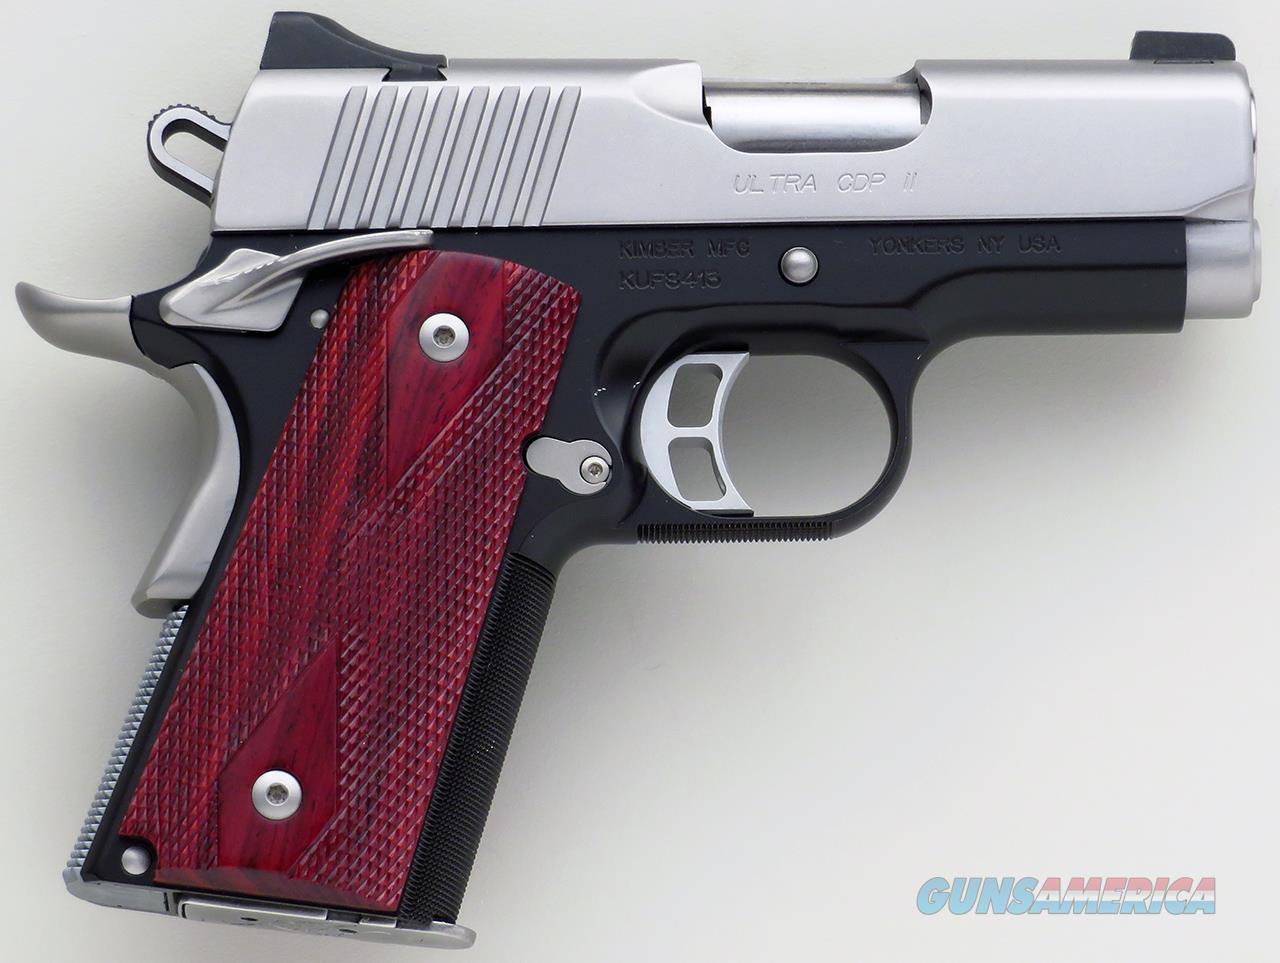 Kimber Ultra CDP II 9mm, 3-inch bull barrel, stainless slide, night sights, front strap checkering  Guns > Pistols > Kimber of America Pistols > 1911